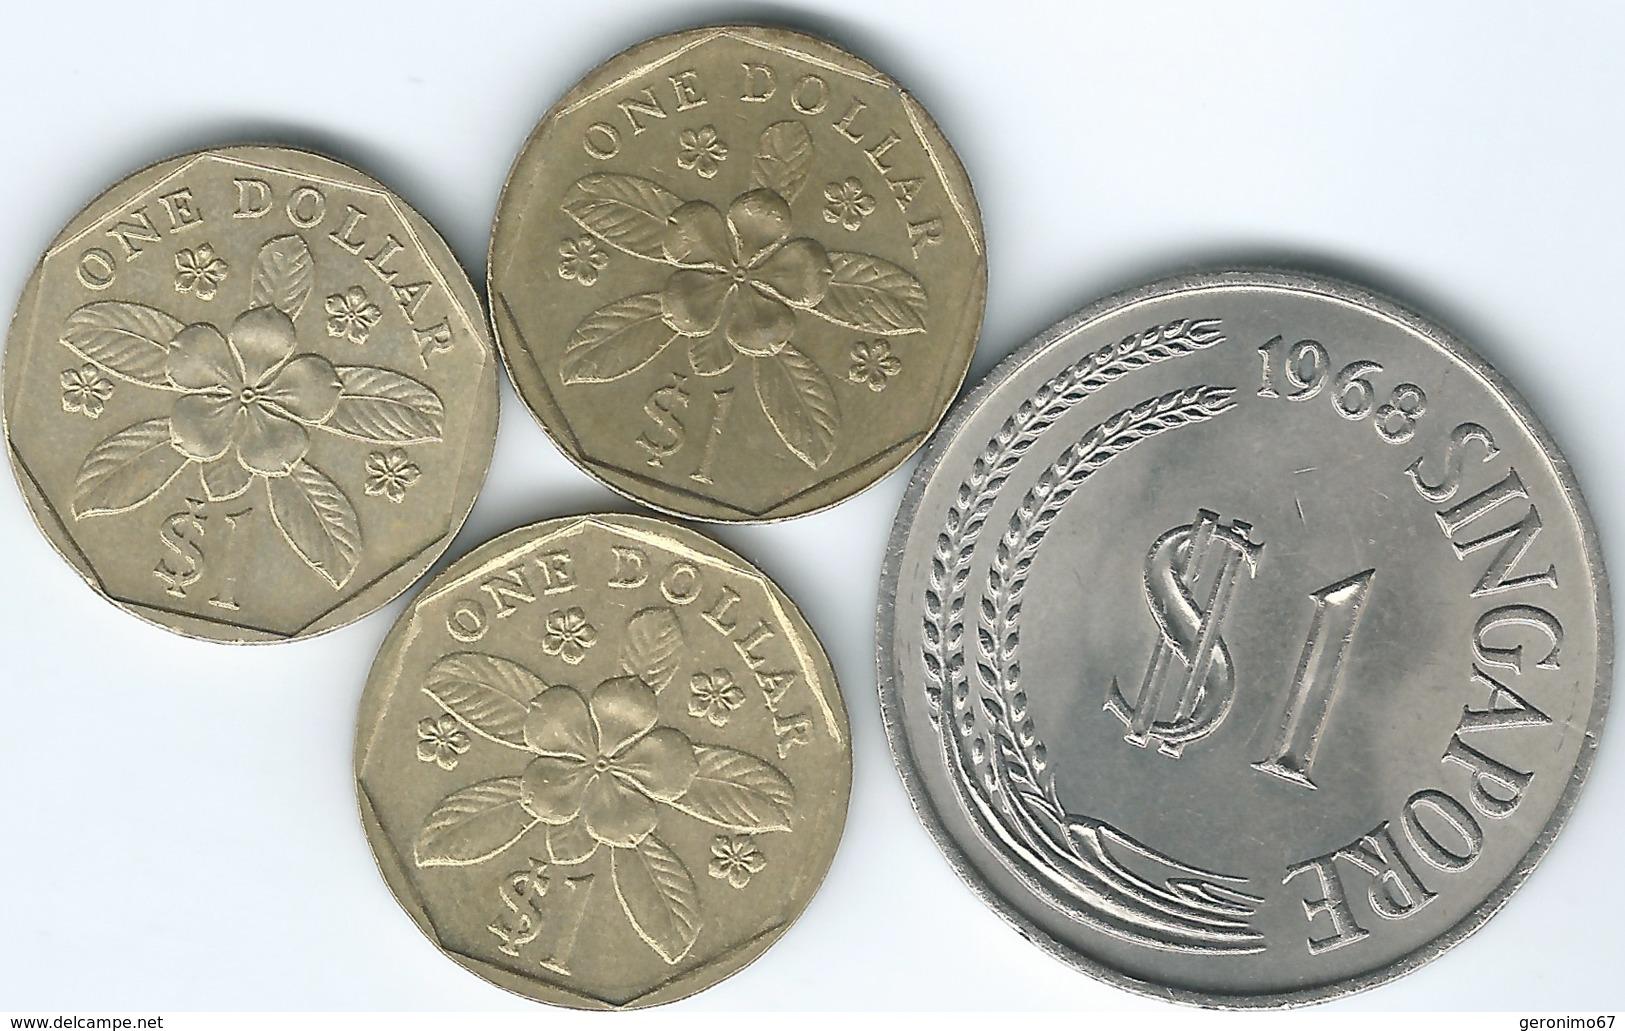 Singapore - 1 Dollar - 1968 (KM6) 1987 (KM54) 1989 (ribbon Upwards - KM54b) 1997 (ribbon Downwards - KM103) - Singapore